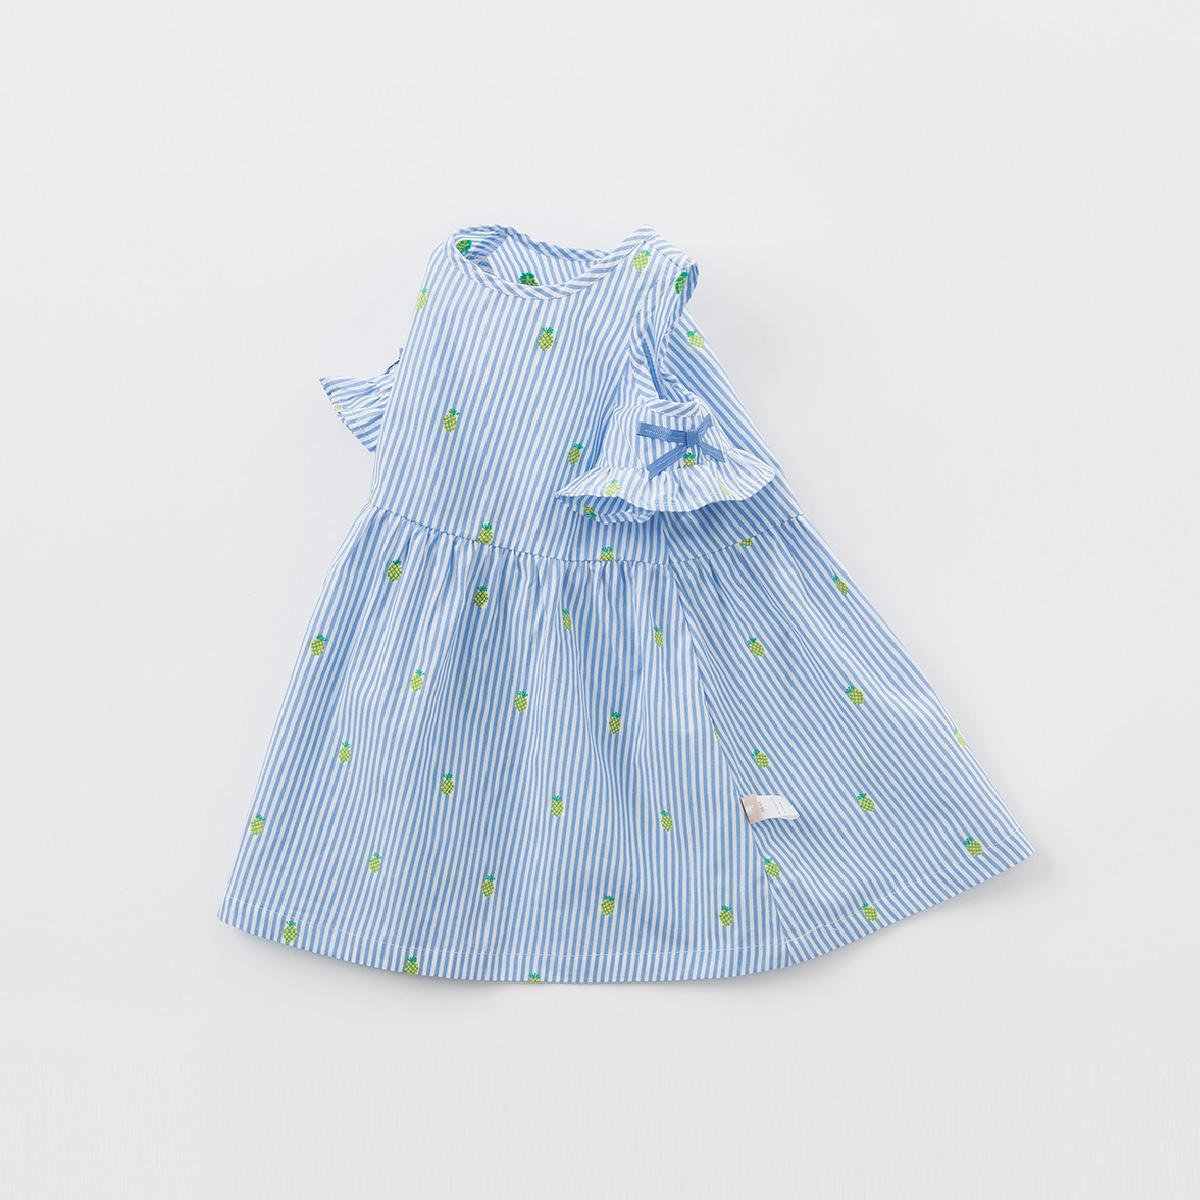 davebella戴维贝拉2018夏季新款连衣裙宝宝条纹露肩连衣裙DBM7431